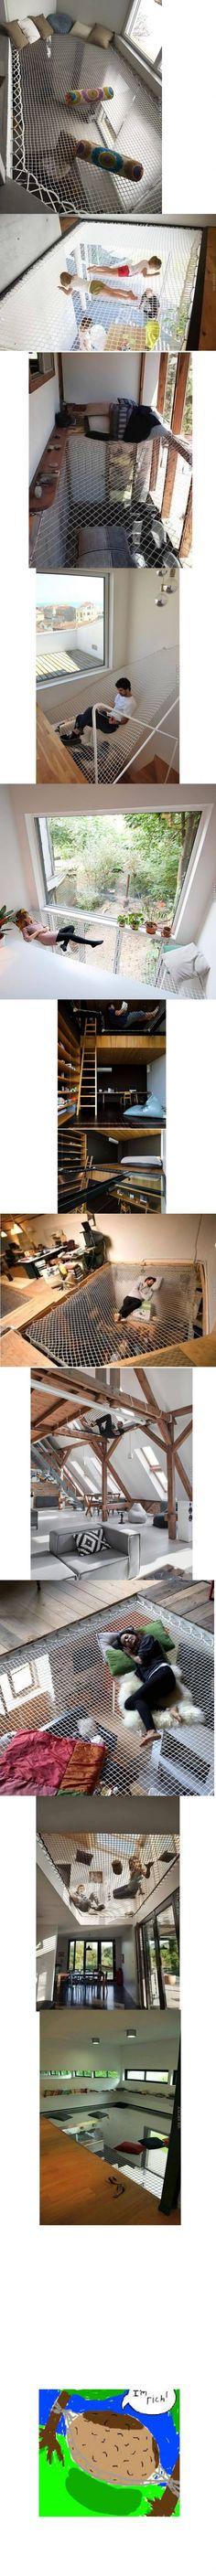 Hammock nets on Houses